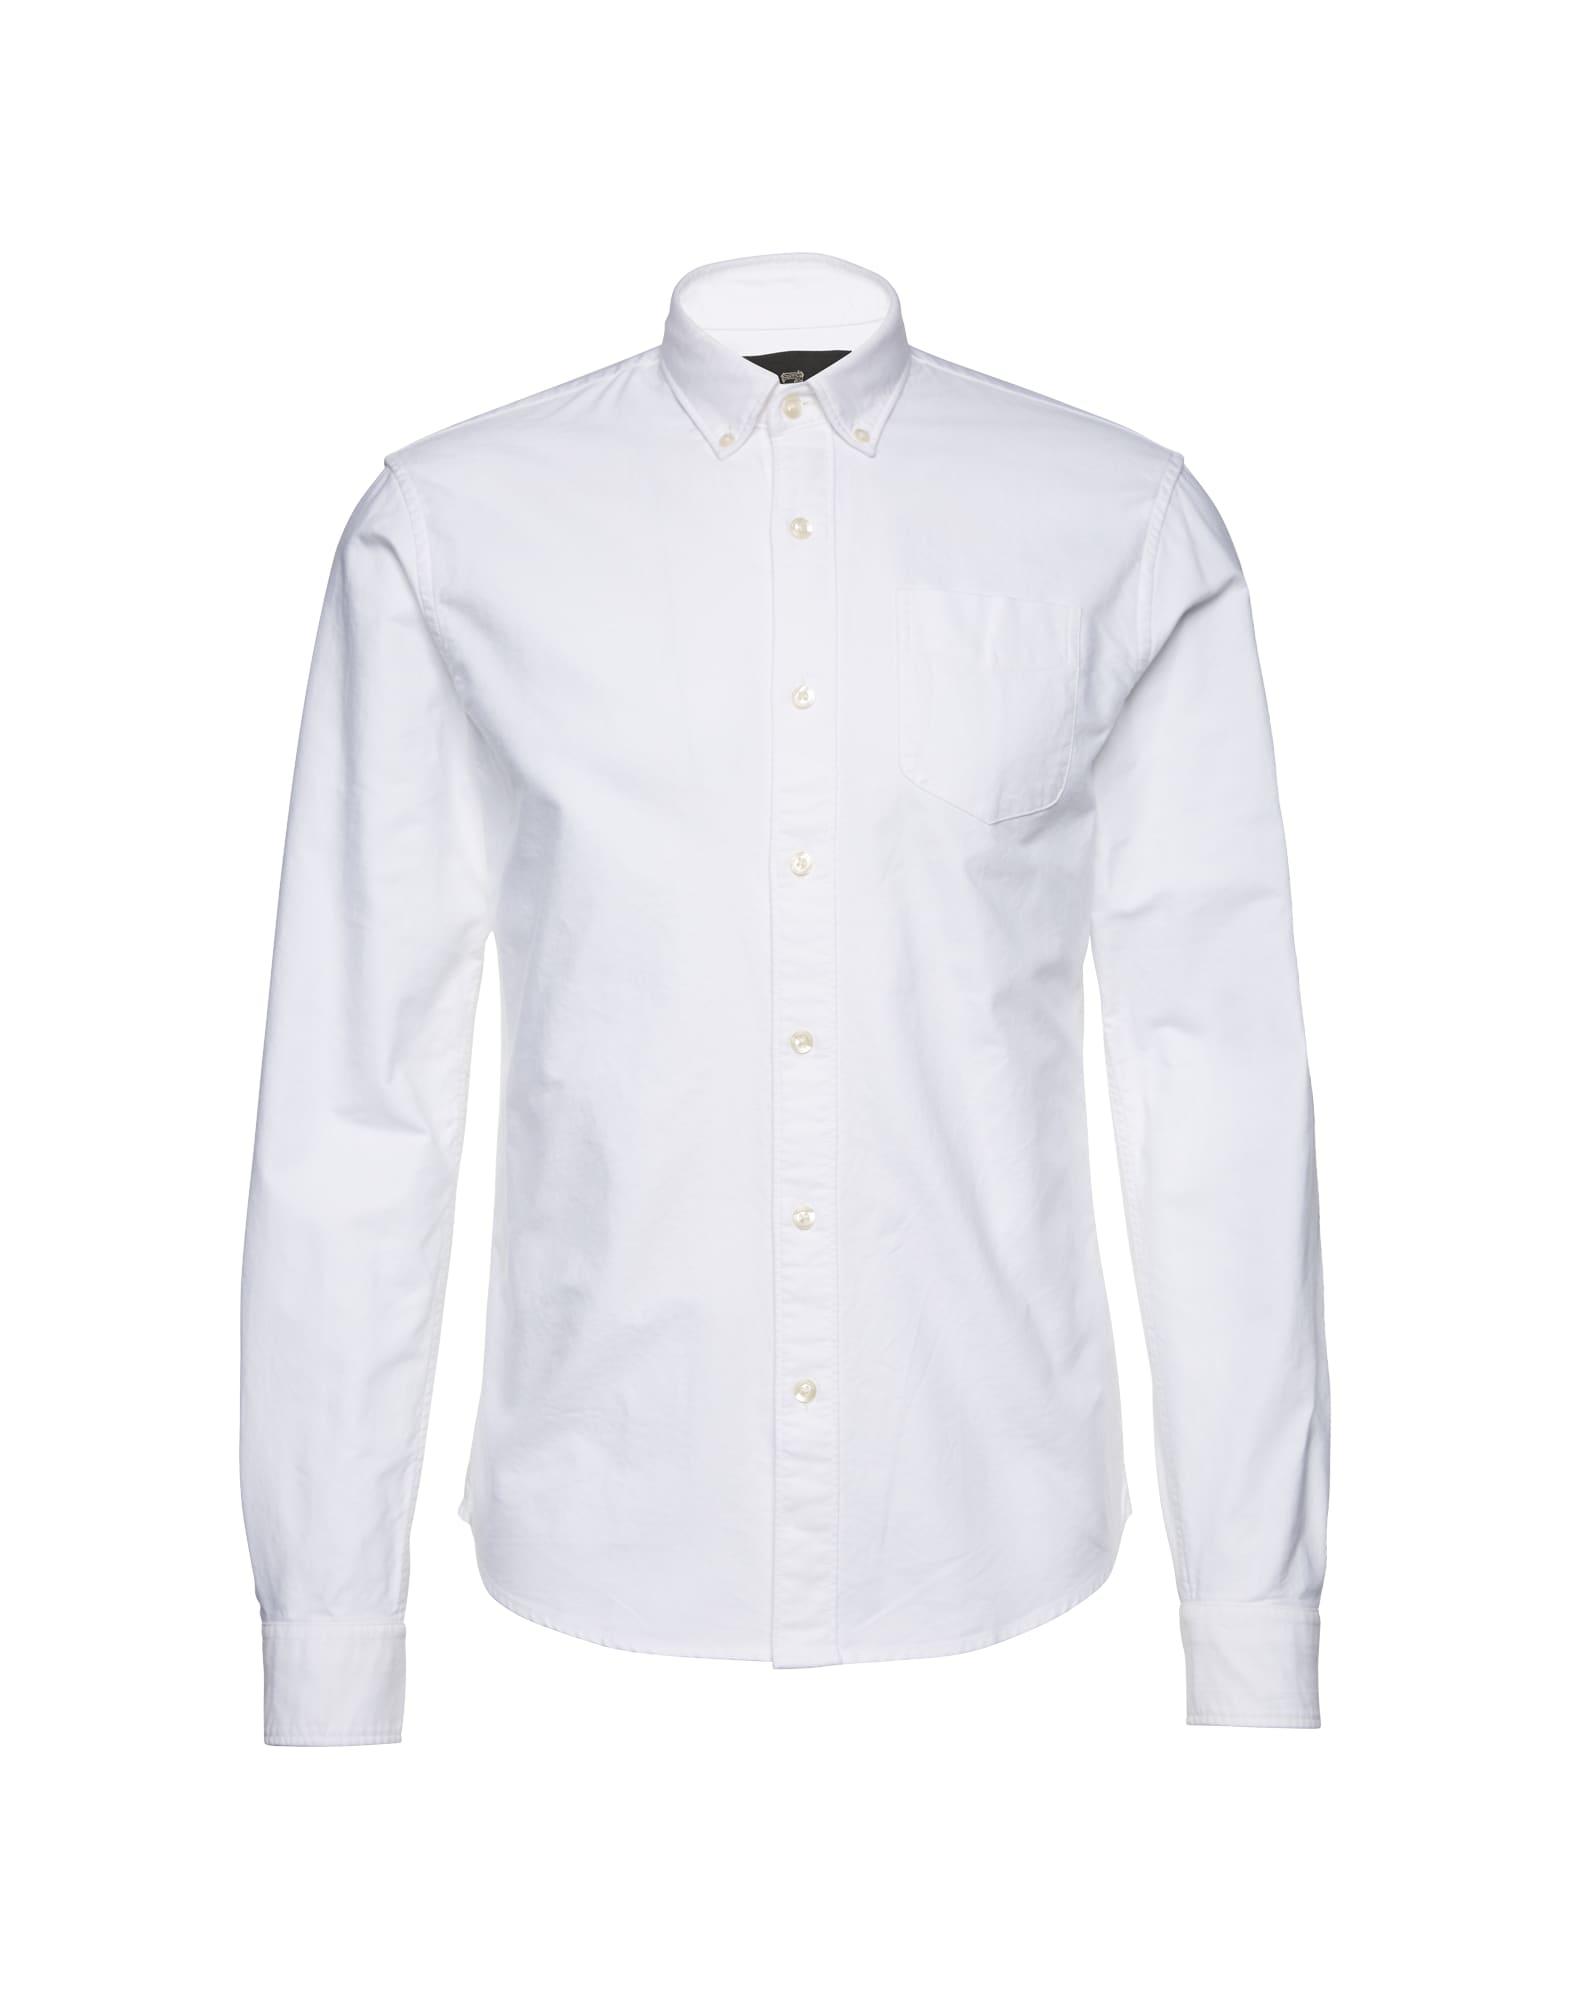 SCOTCH  and  SODA Heren Zakelijk overhemd Classic Oxford Shirt wit